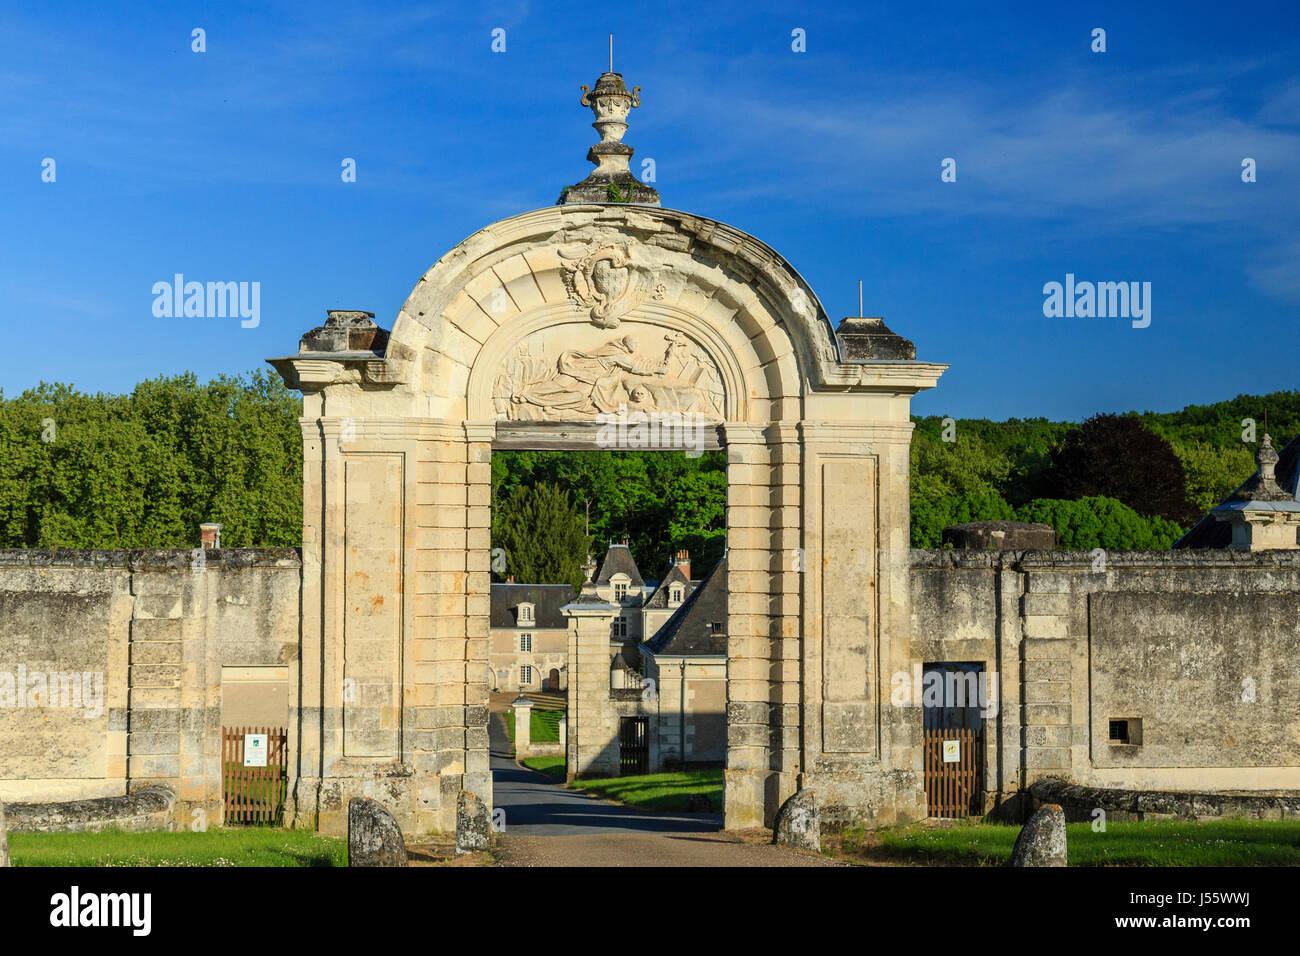 France, Indre et Loire, Chemille sur Indrois, Chartreuse of Liget, entrance portal - Stock Image